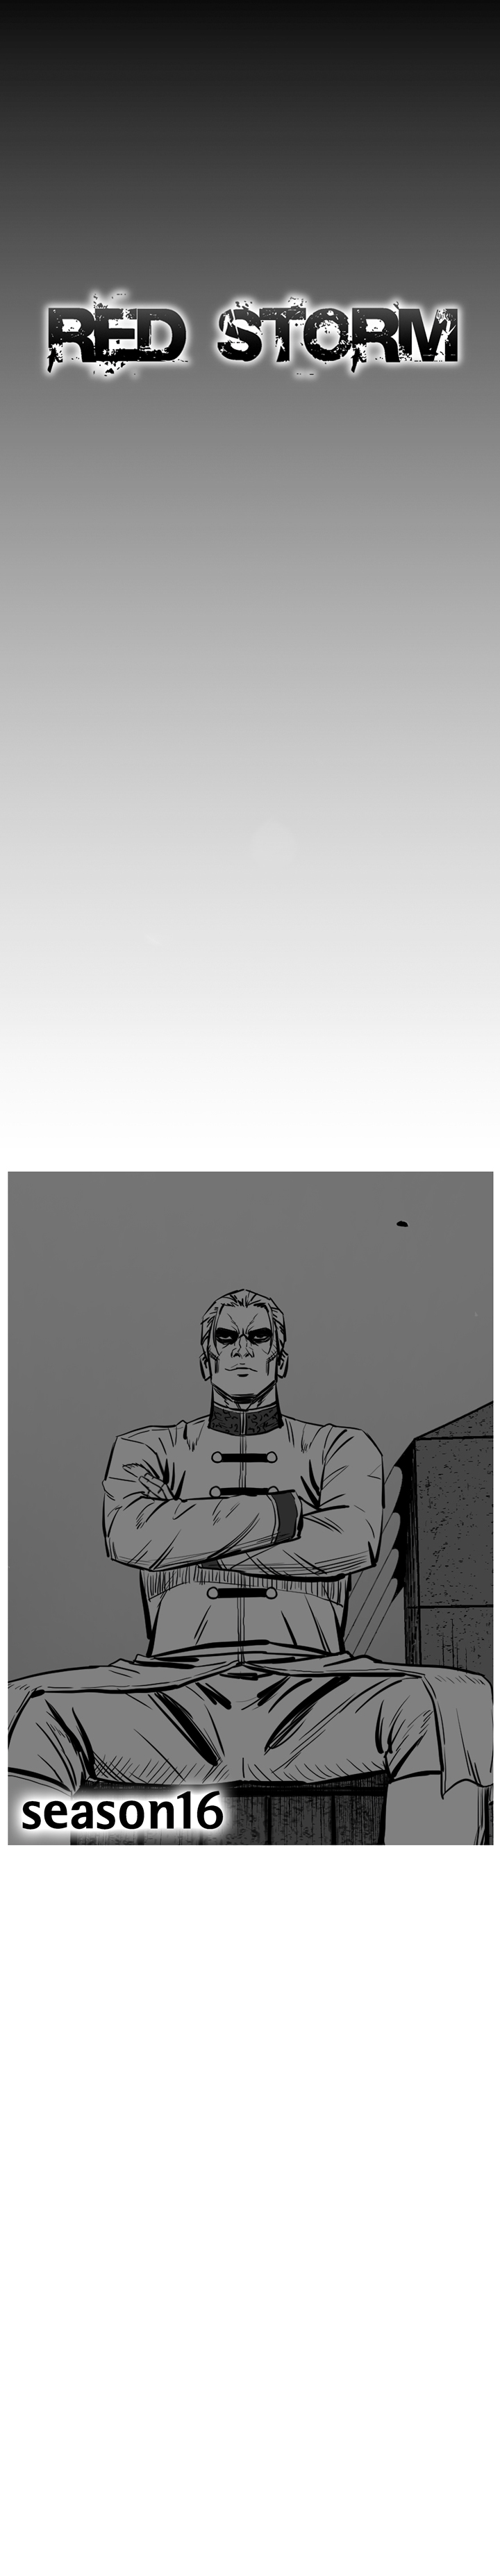 https://manga.mangadogs.com/comics/pic2/19/403/933018/5d273677652ec19562d9db111abf46d3.jpg Page 1